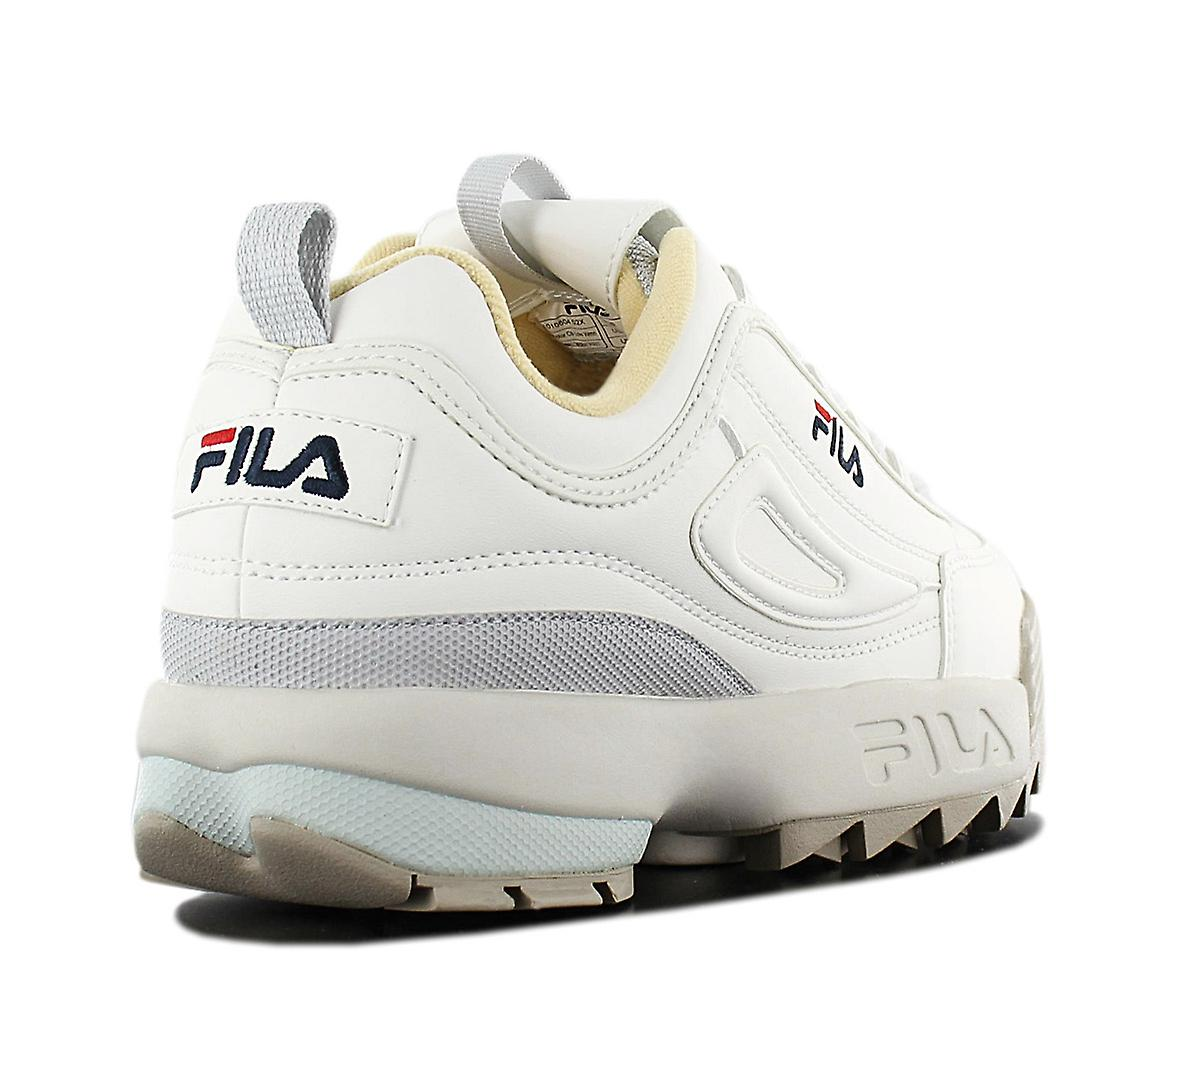 Fila Disruptor CB Low 1010604.02X Damen Schuhe Weiß Sneaker Sportschuhe